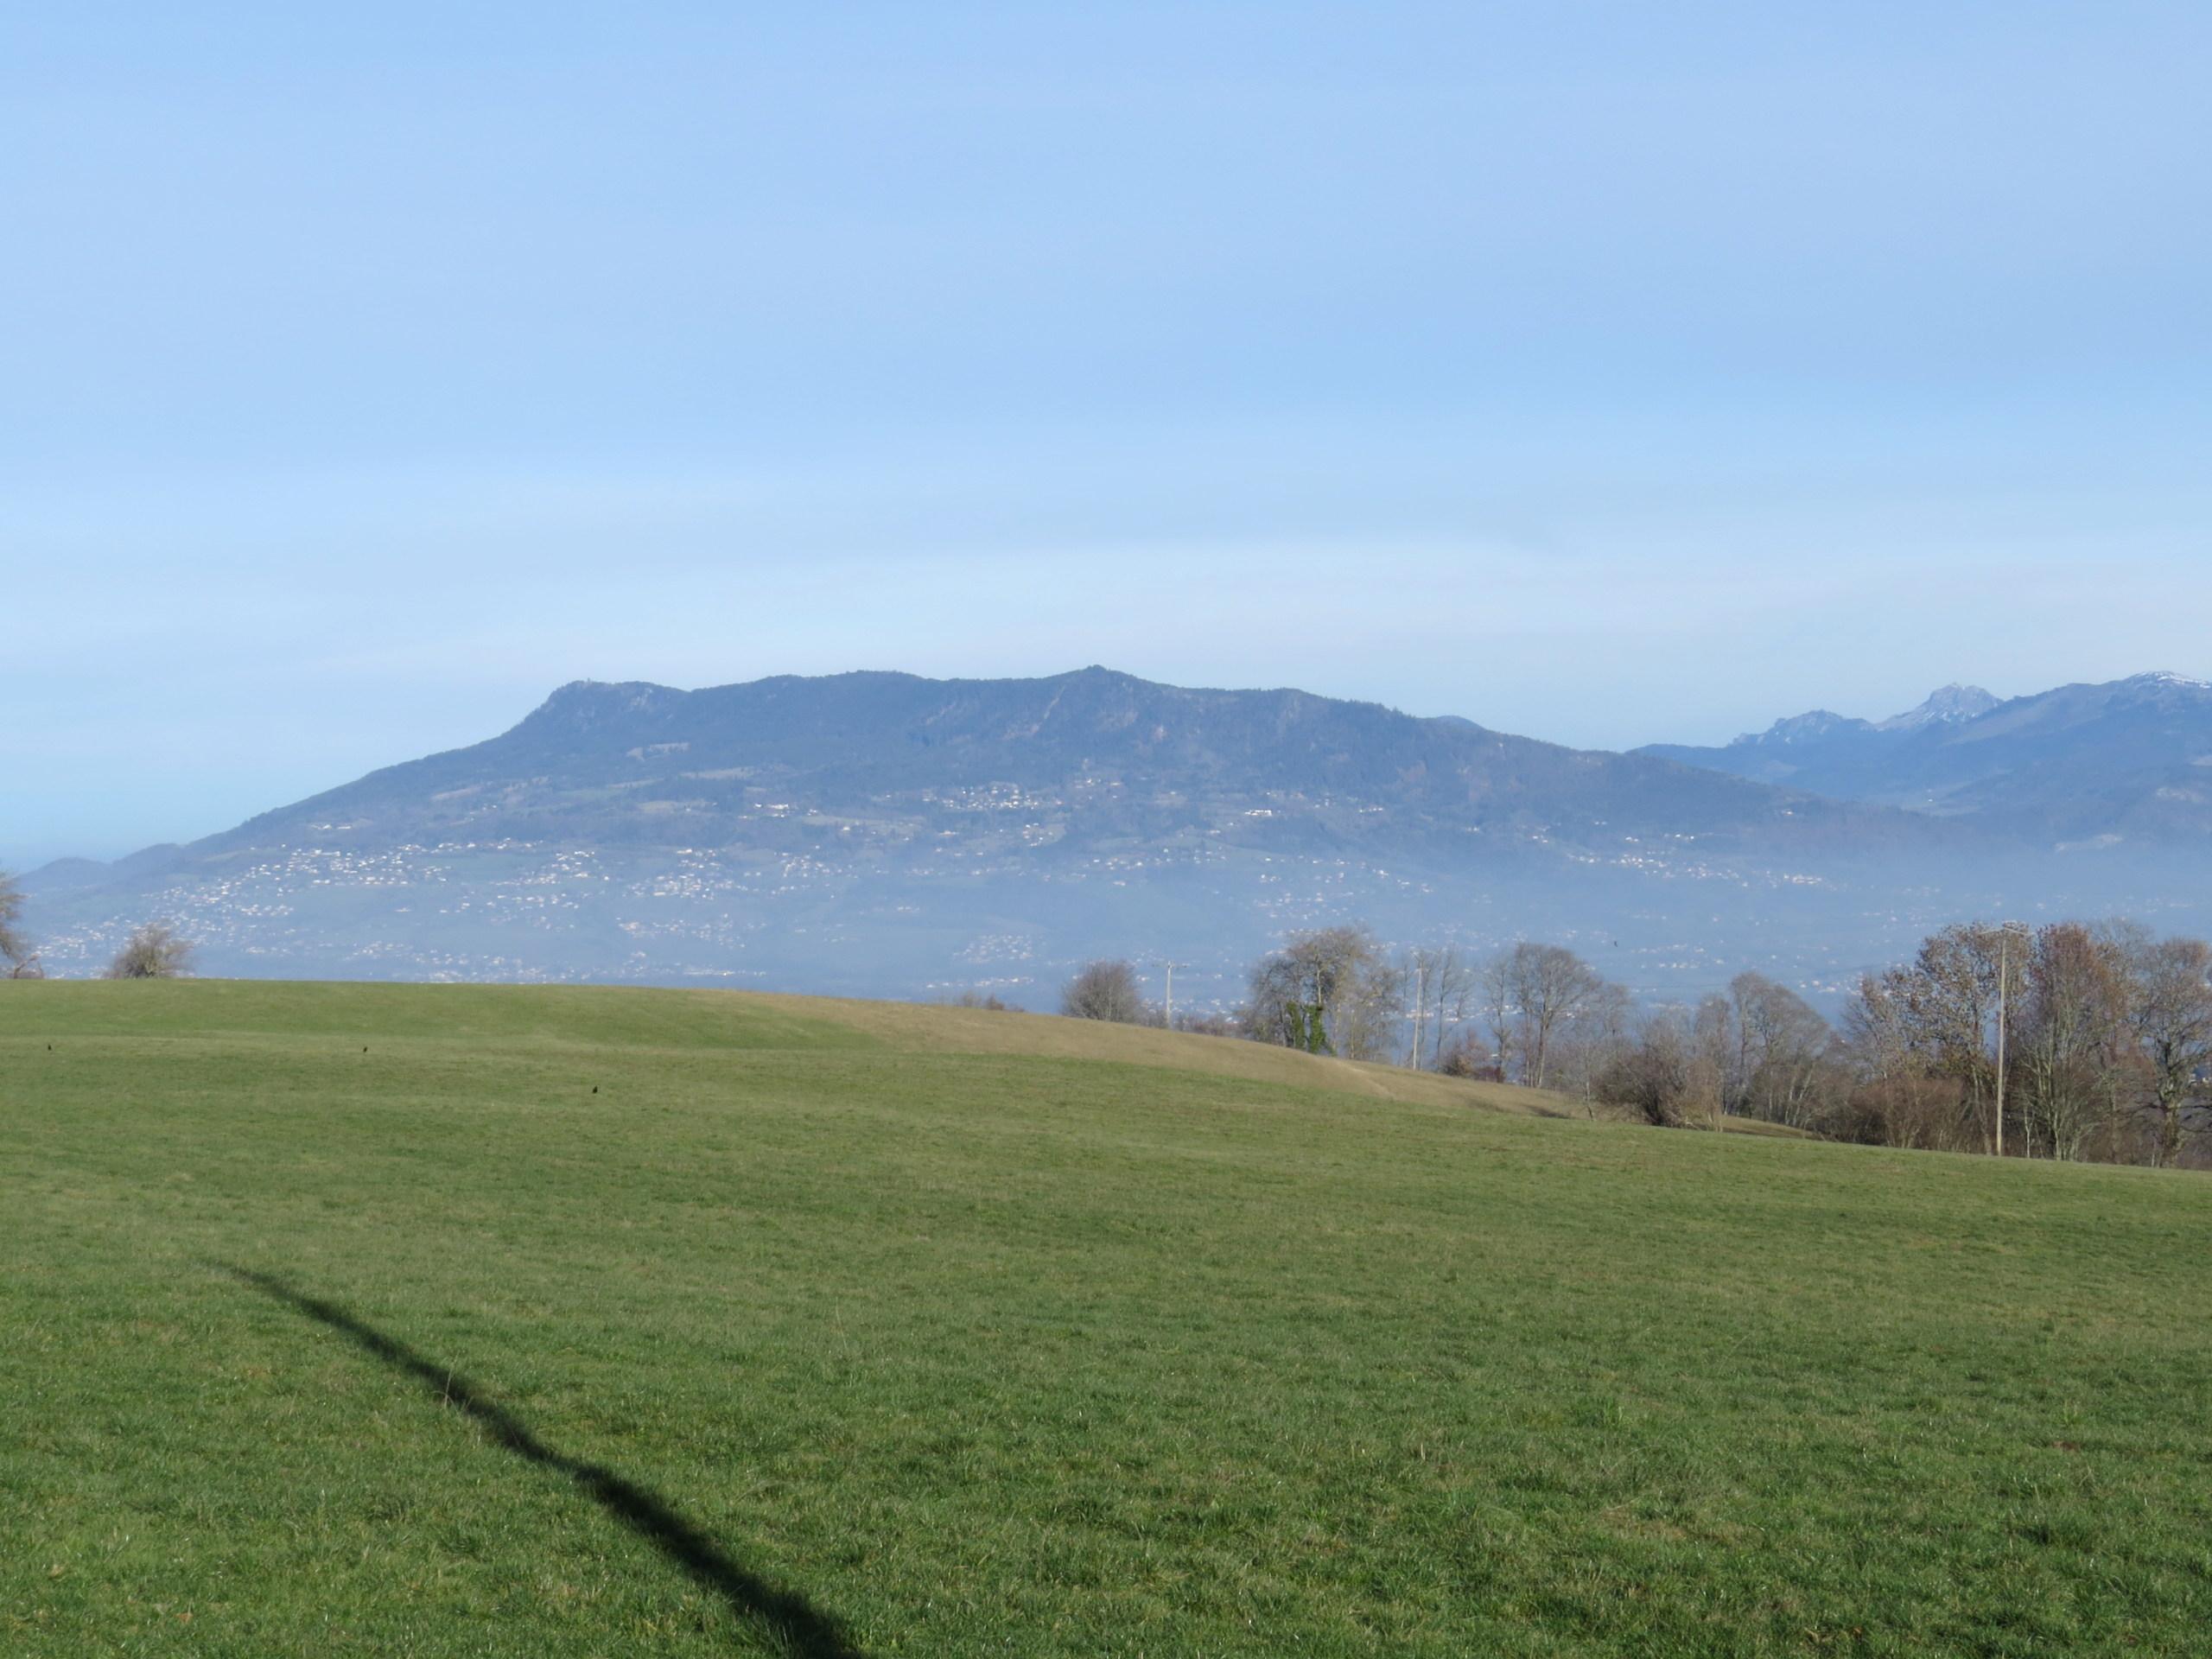 Balades canines: Pays de Gex/Jura/Genève ou Albertville (73) - Page 8 Img_3868